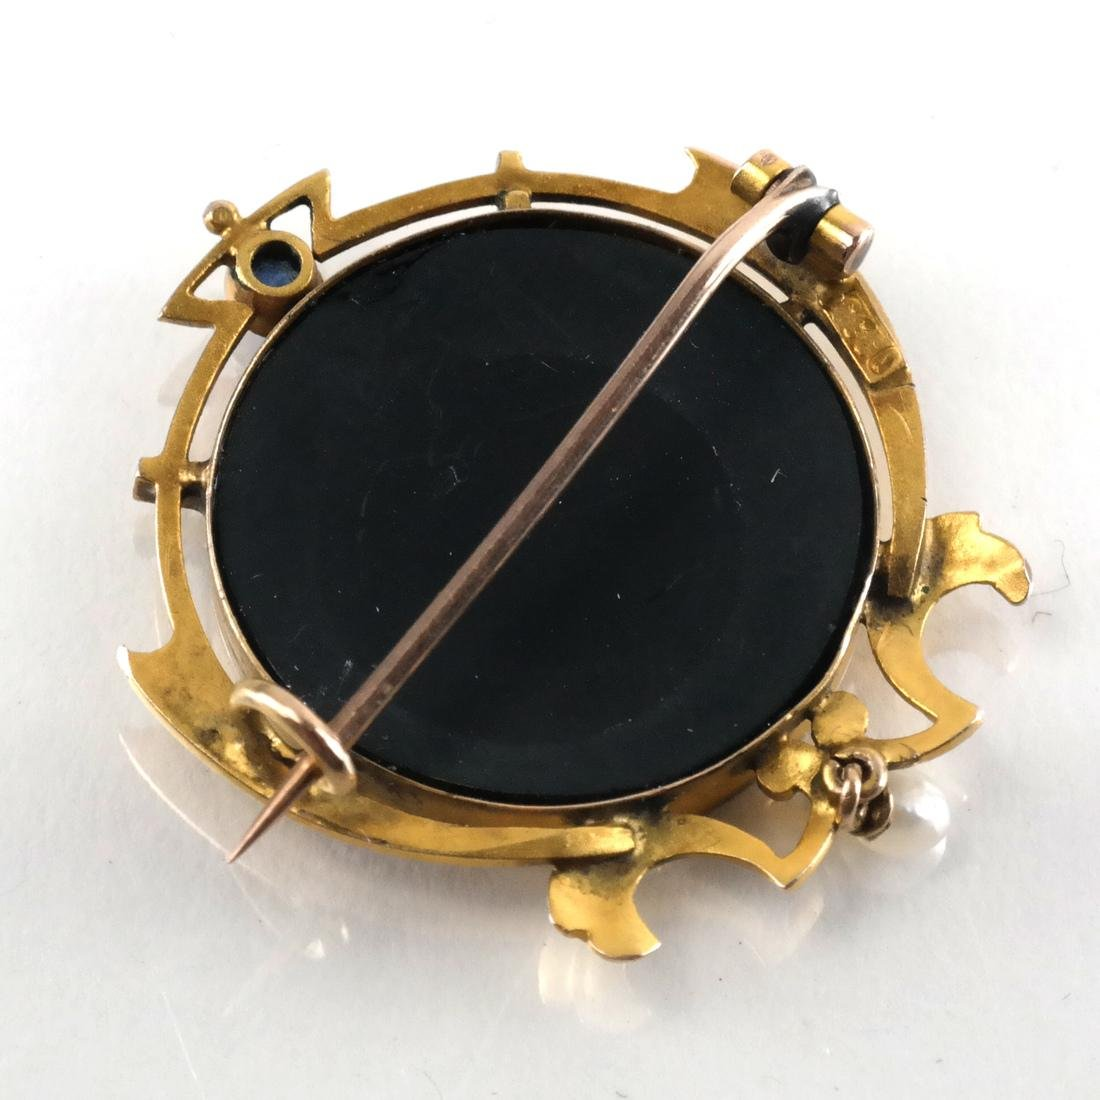 8k Yellow Gold Pin Set w/ Onyx, Sapphire, Pearl - 3